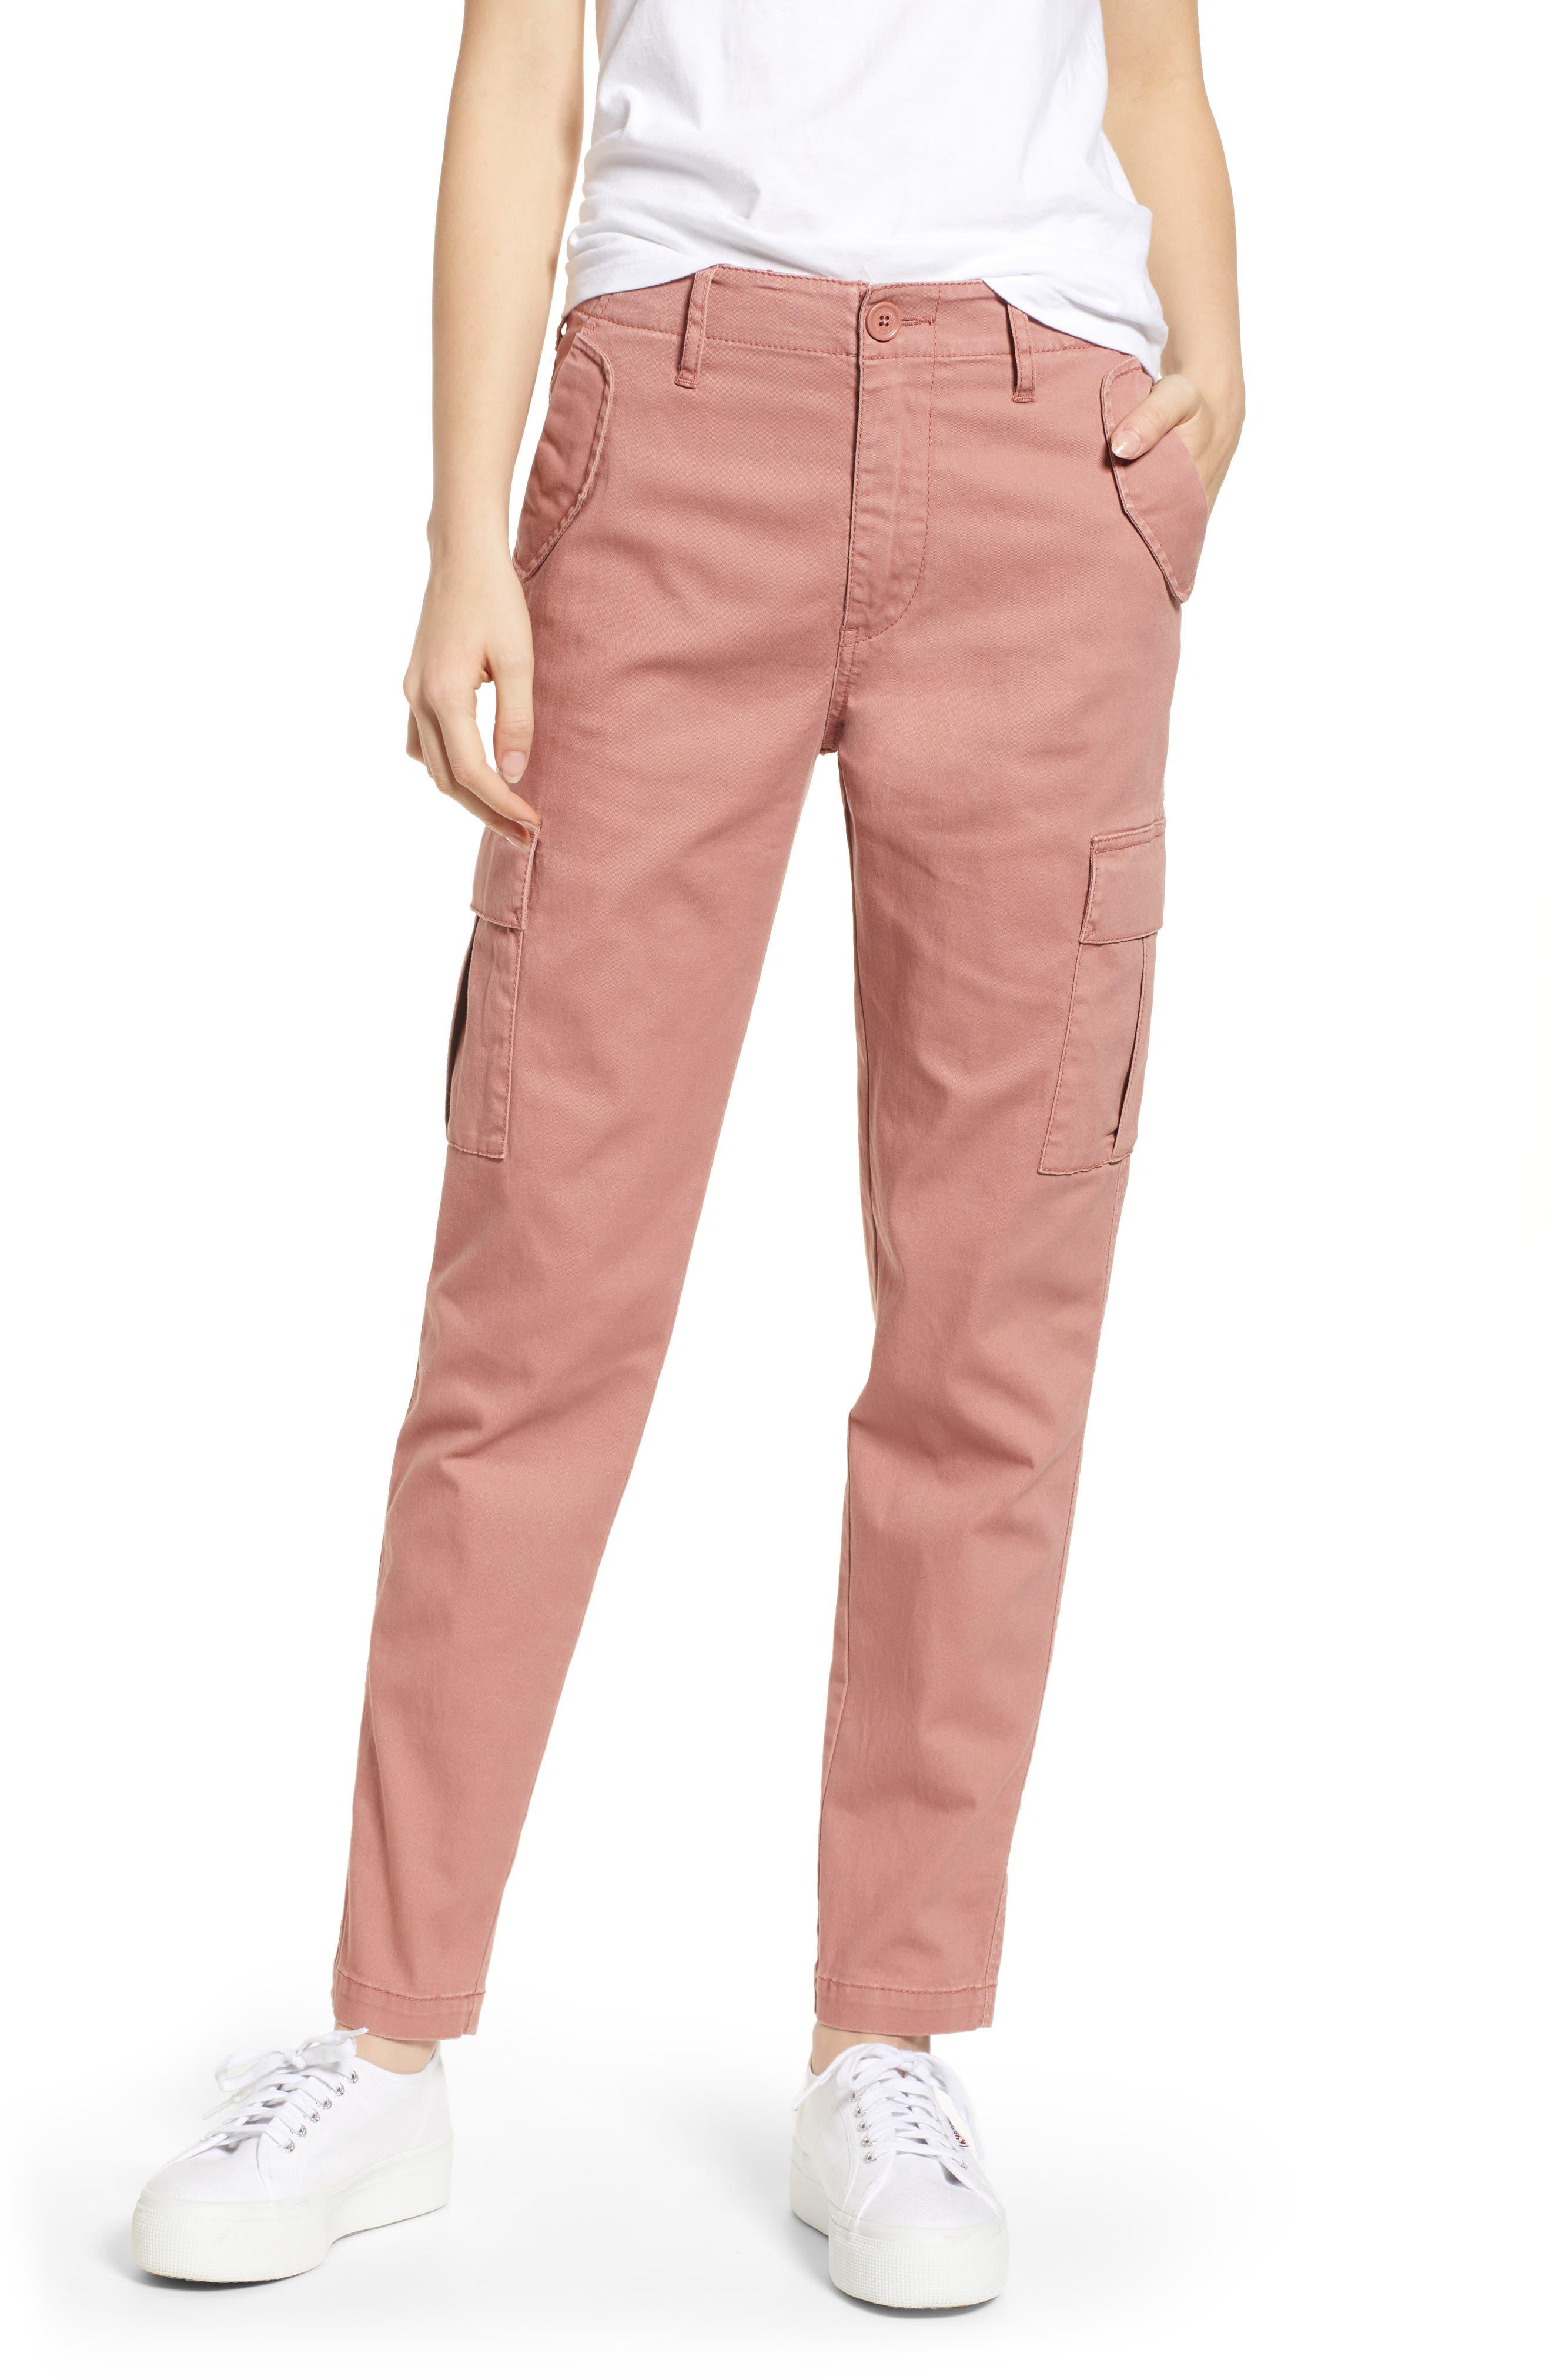 Union Bay Garner Military Cargo Pants, Pink